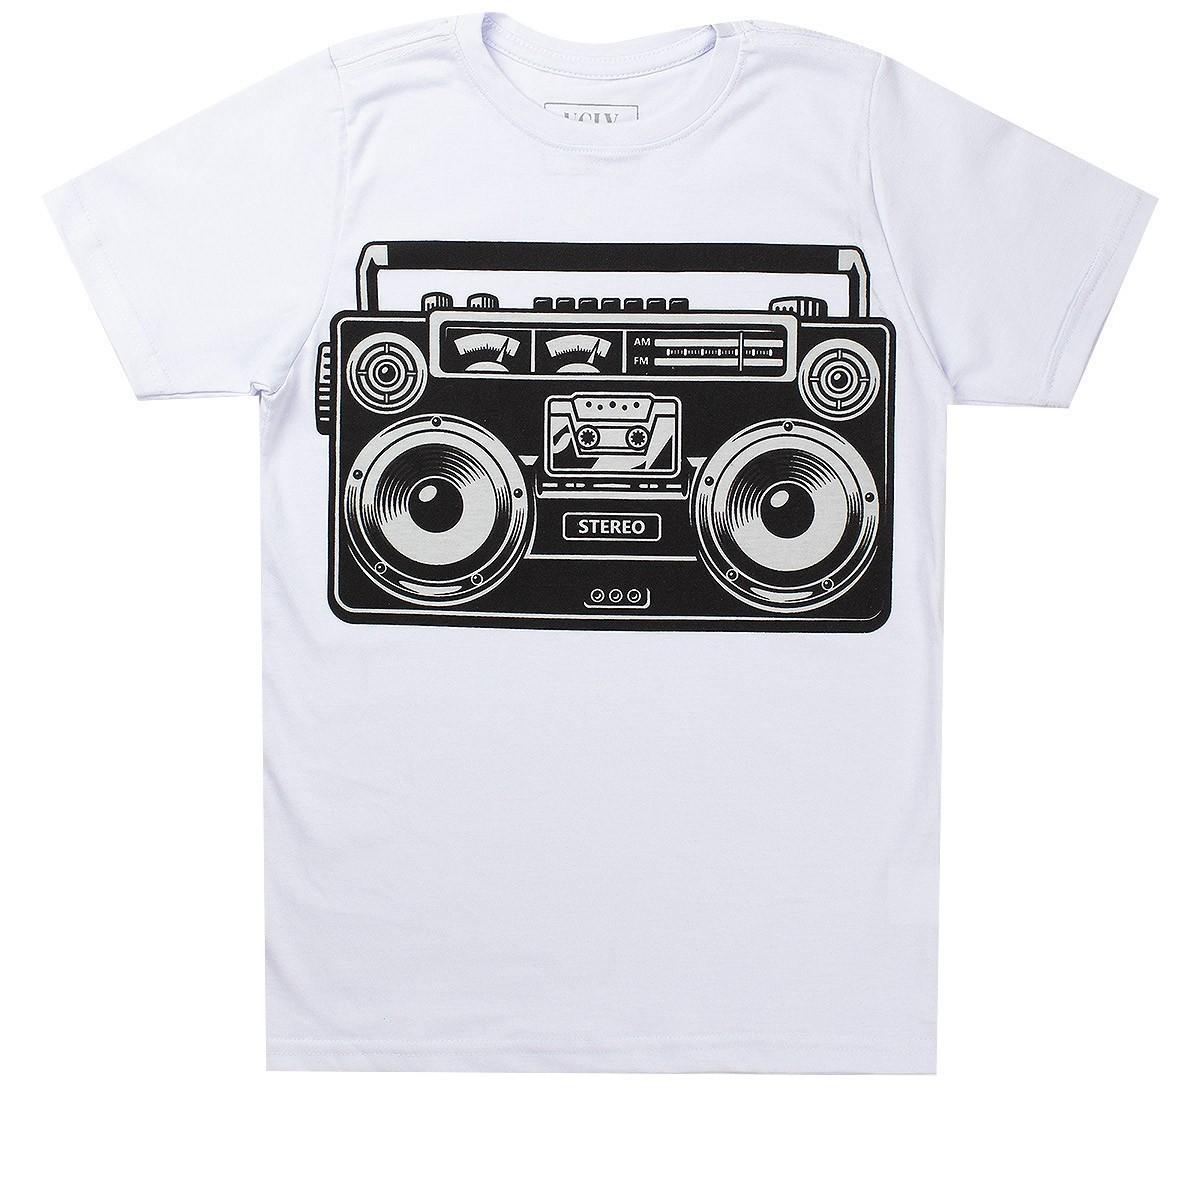 Kit 4 Camisetas Infantil Masculina Atacado Estampadas